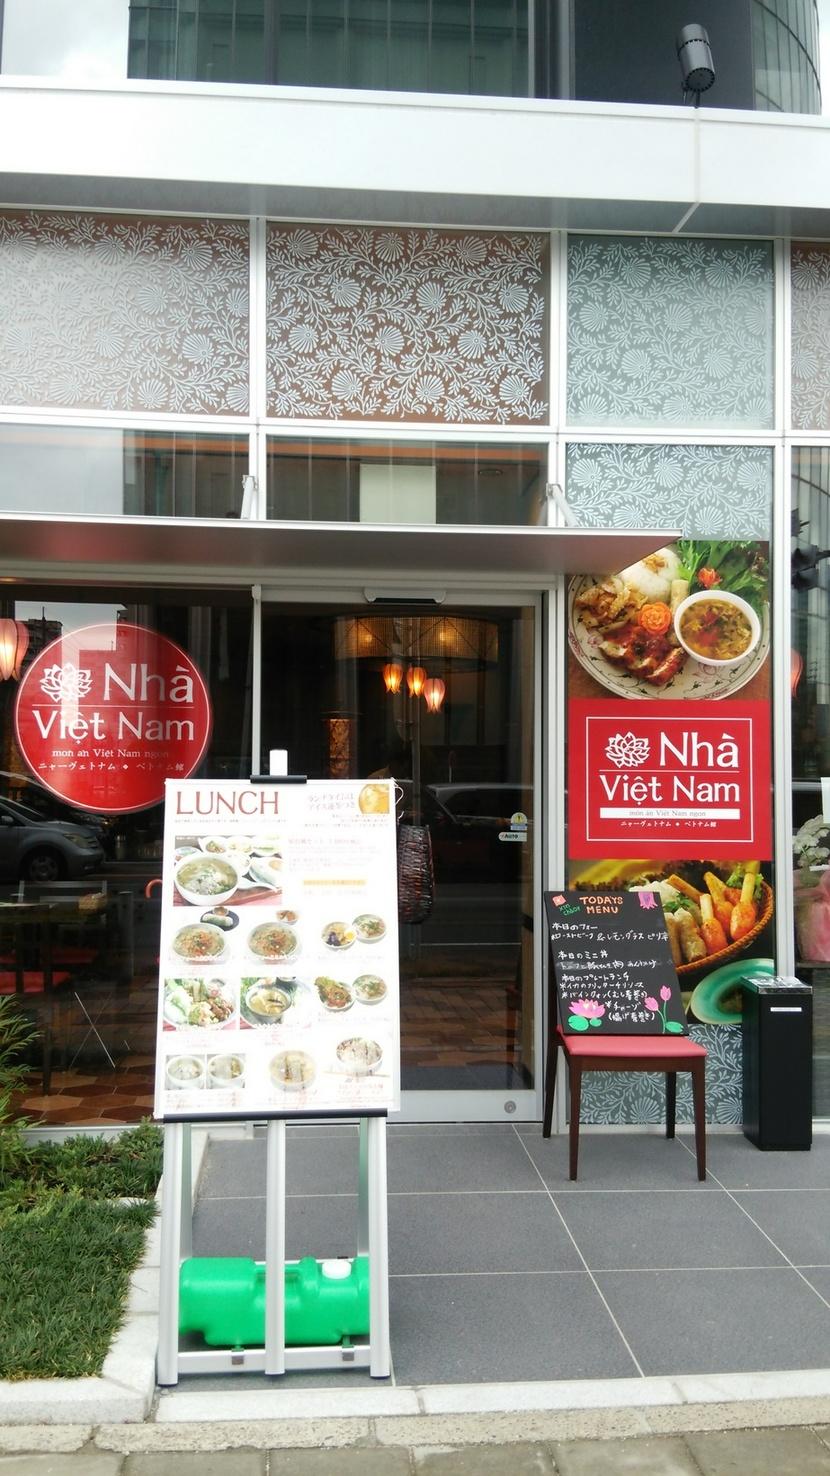 Nha Viet Nam 名古屋店